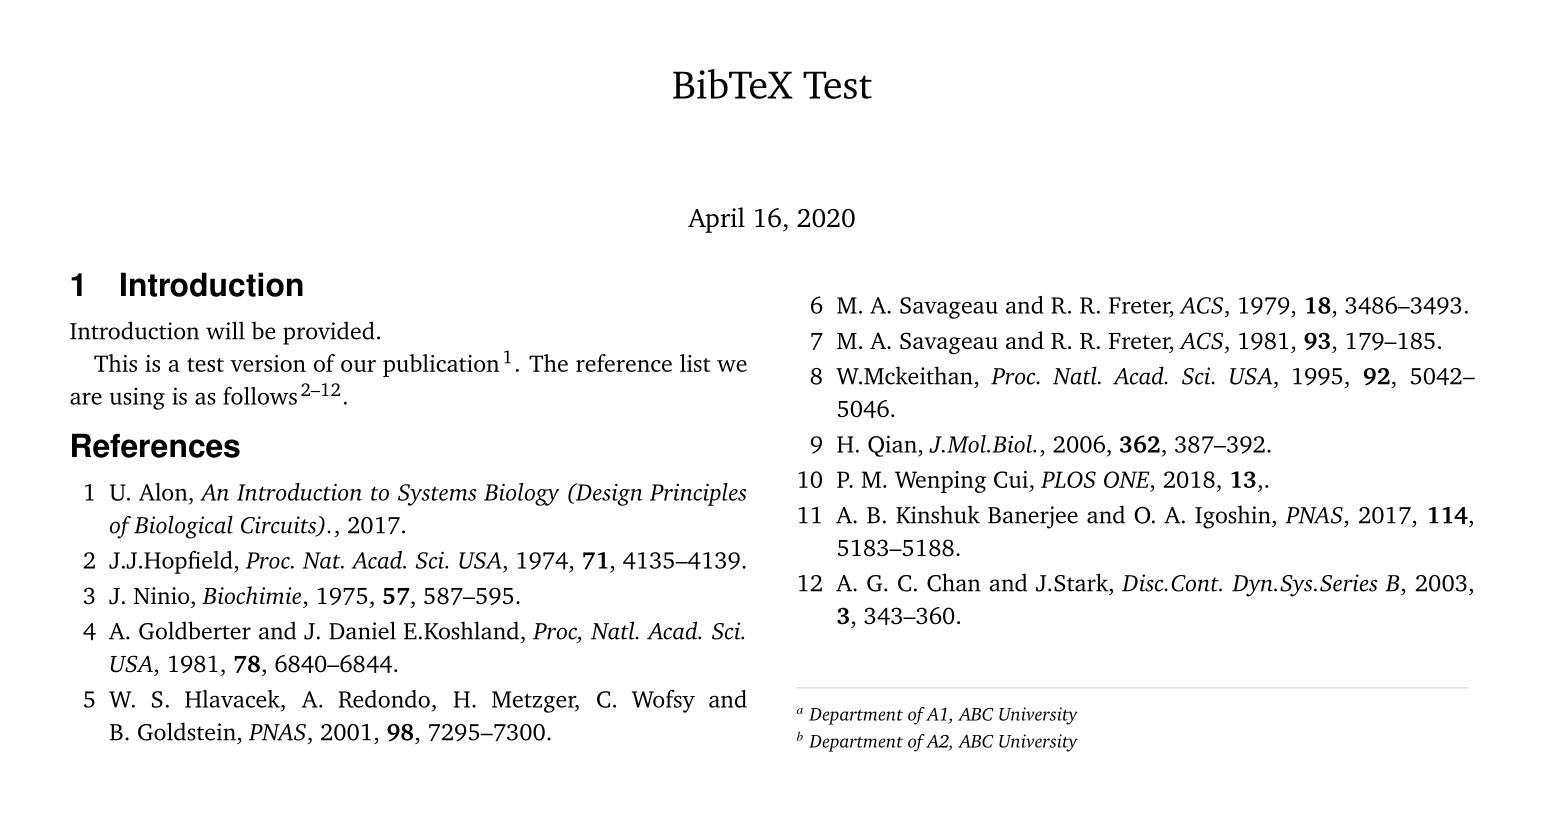 bibtex_test.jpg